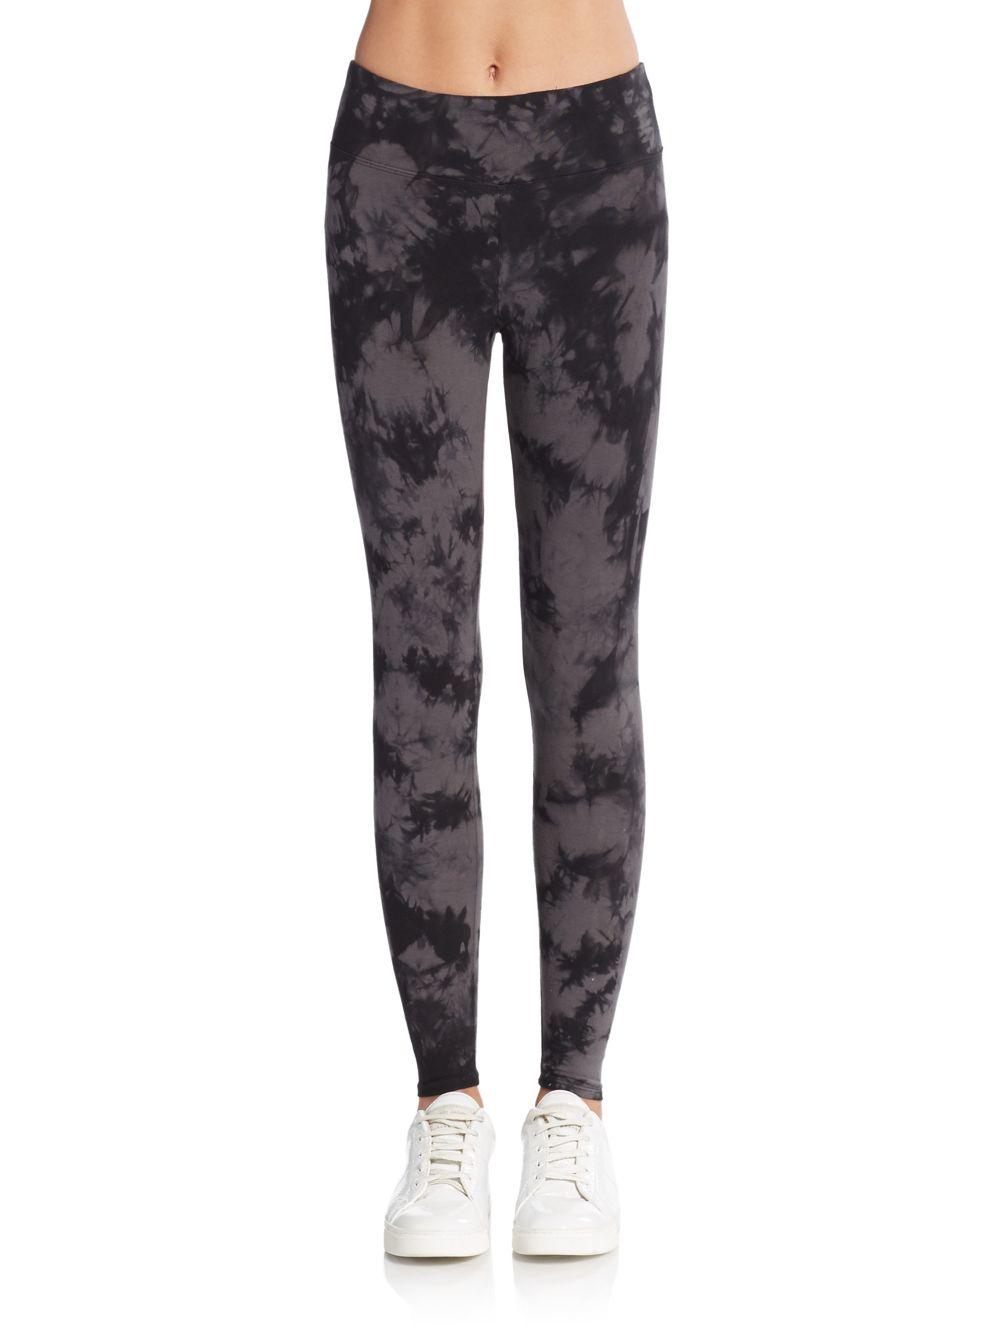 calvin klein tie dye leggings in black lyst. Black Bedroom Furniture Sets. Home Design Ideas